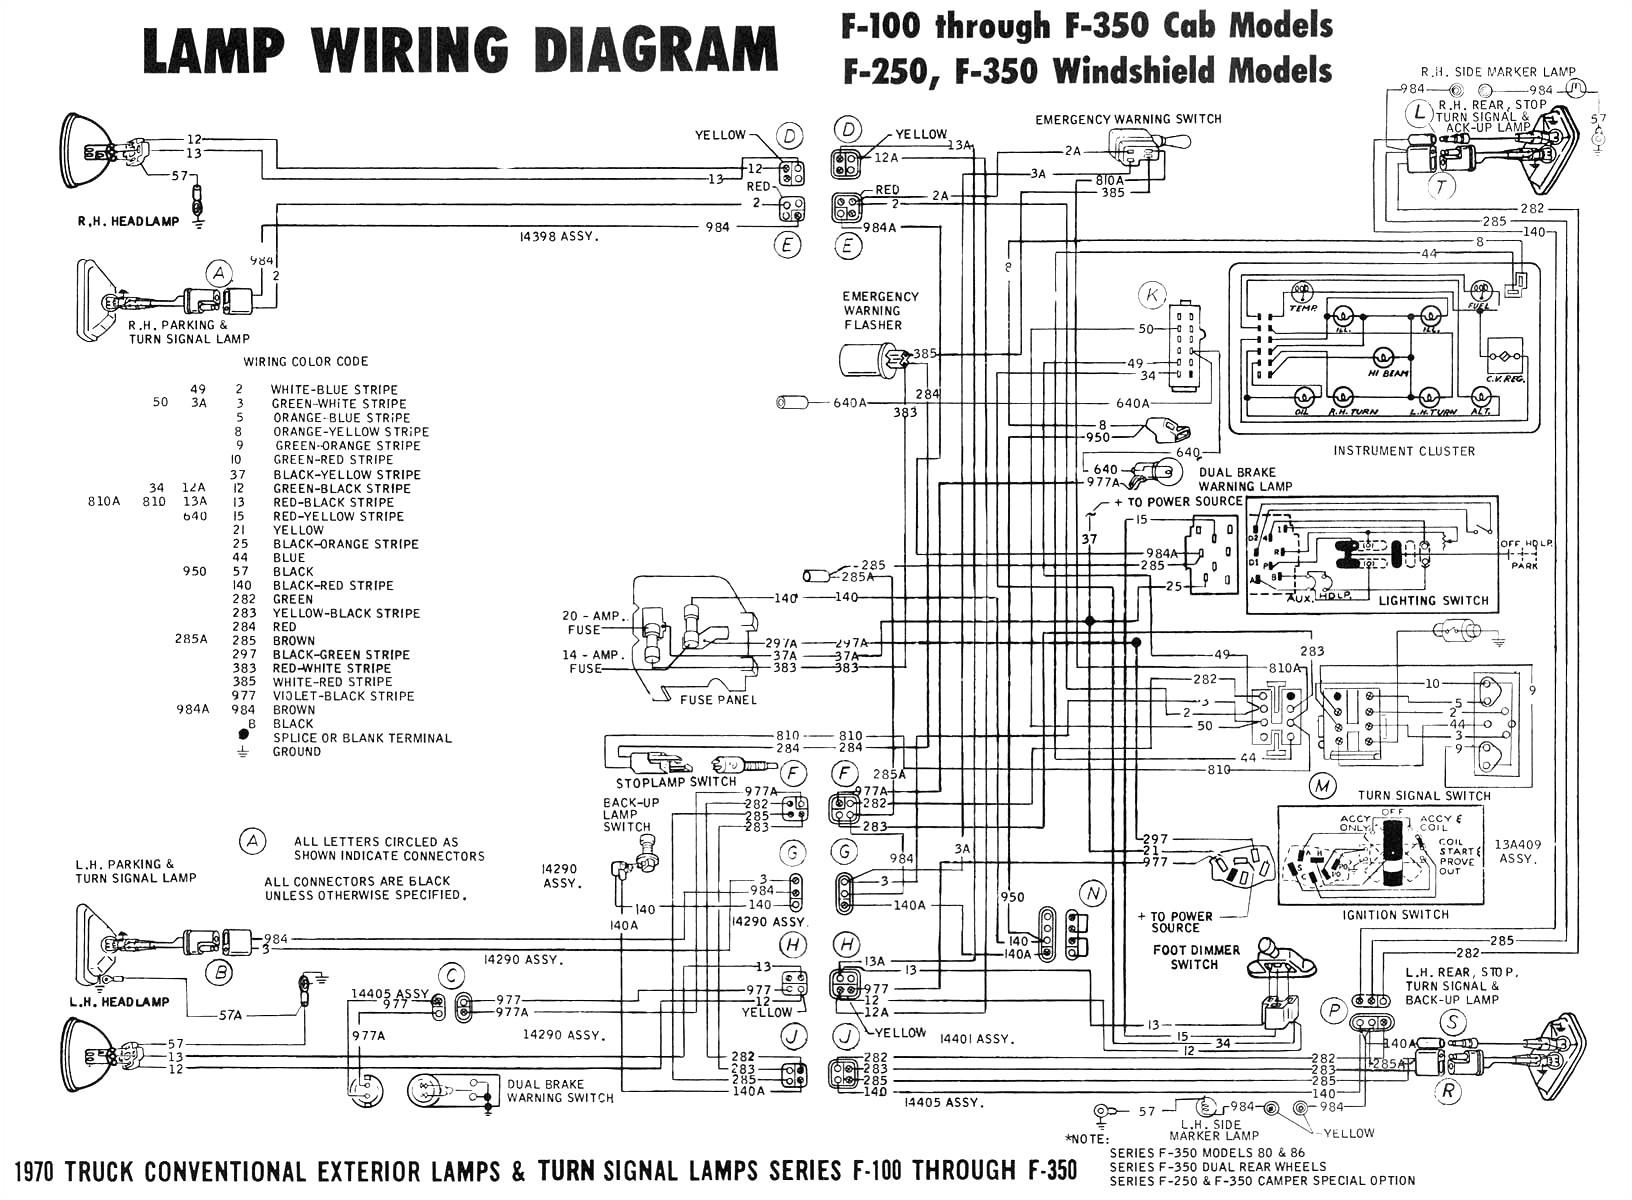 1995 ford f 350 wiring schematic wiring diagram user asco wt8551 wiring diagram